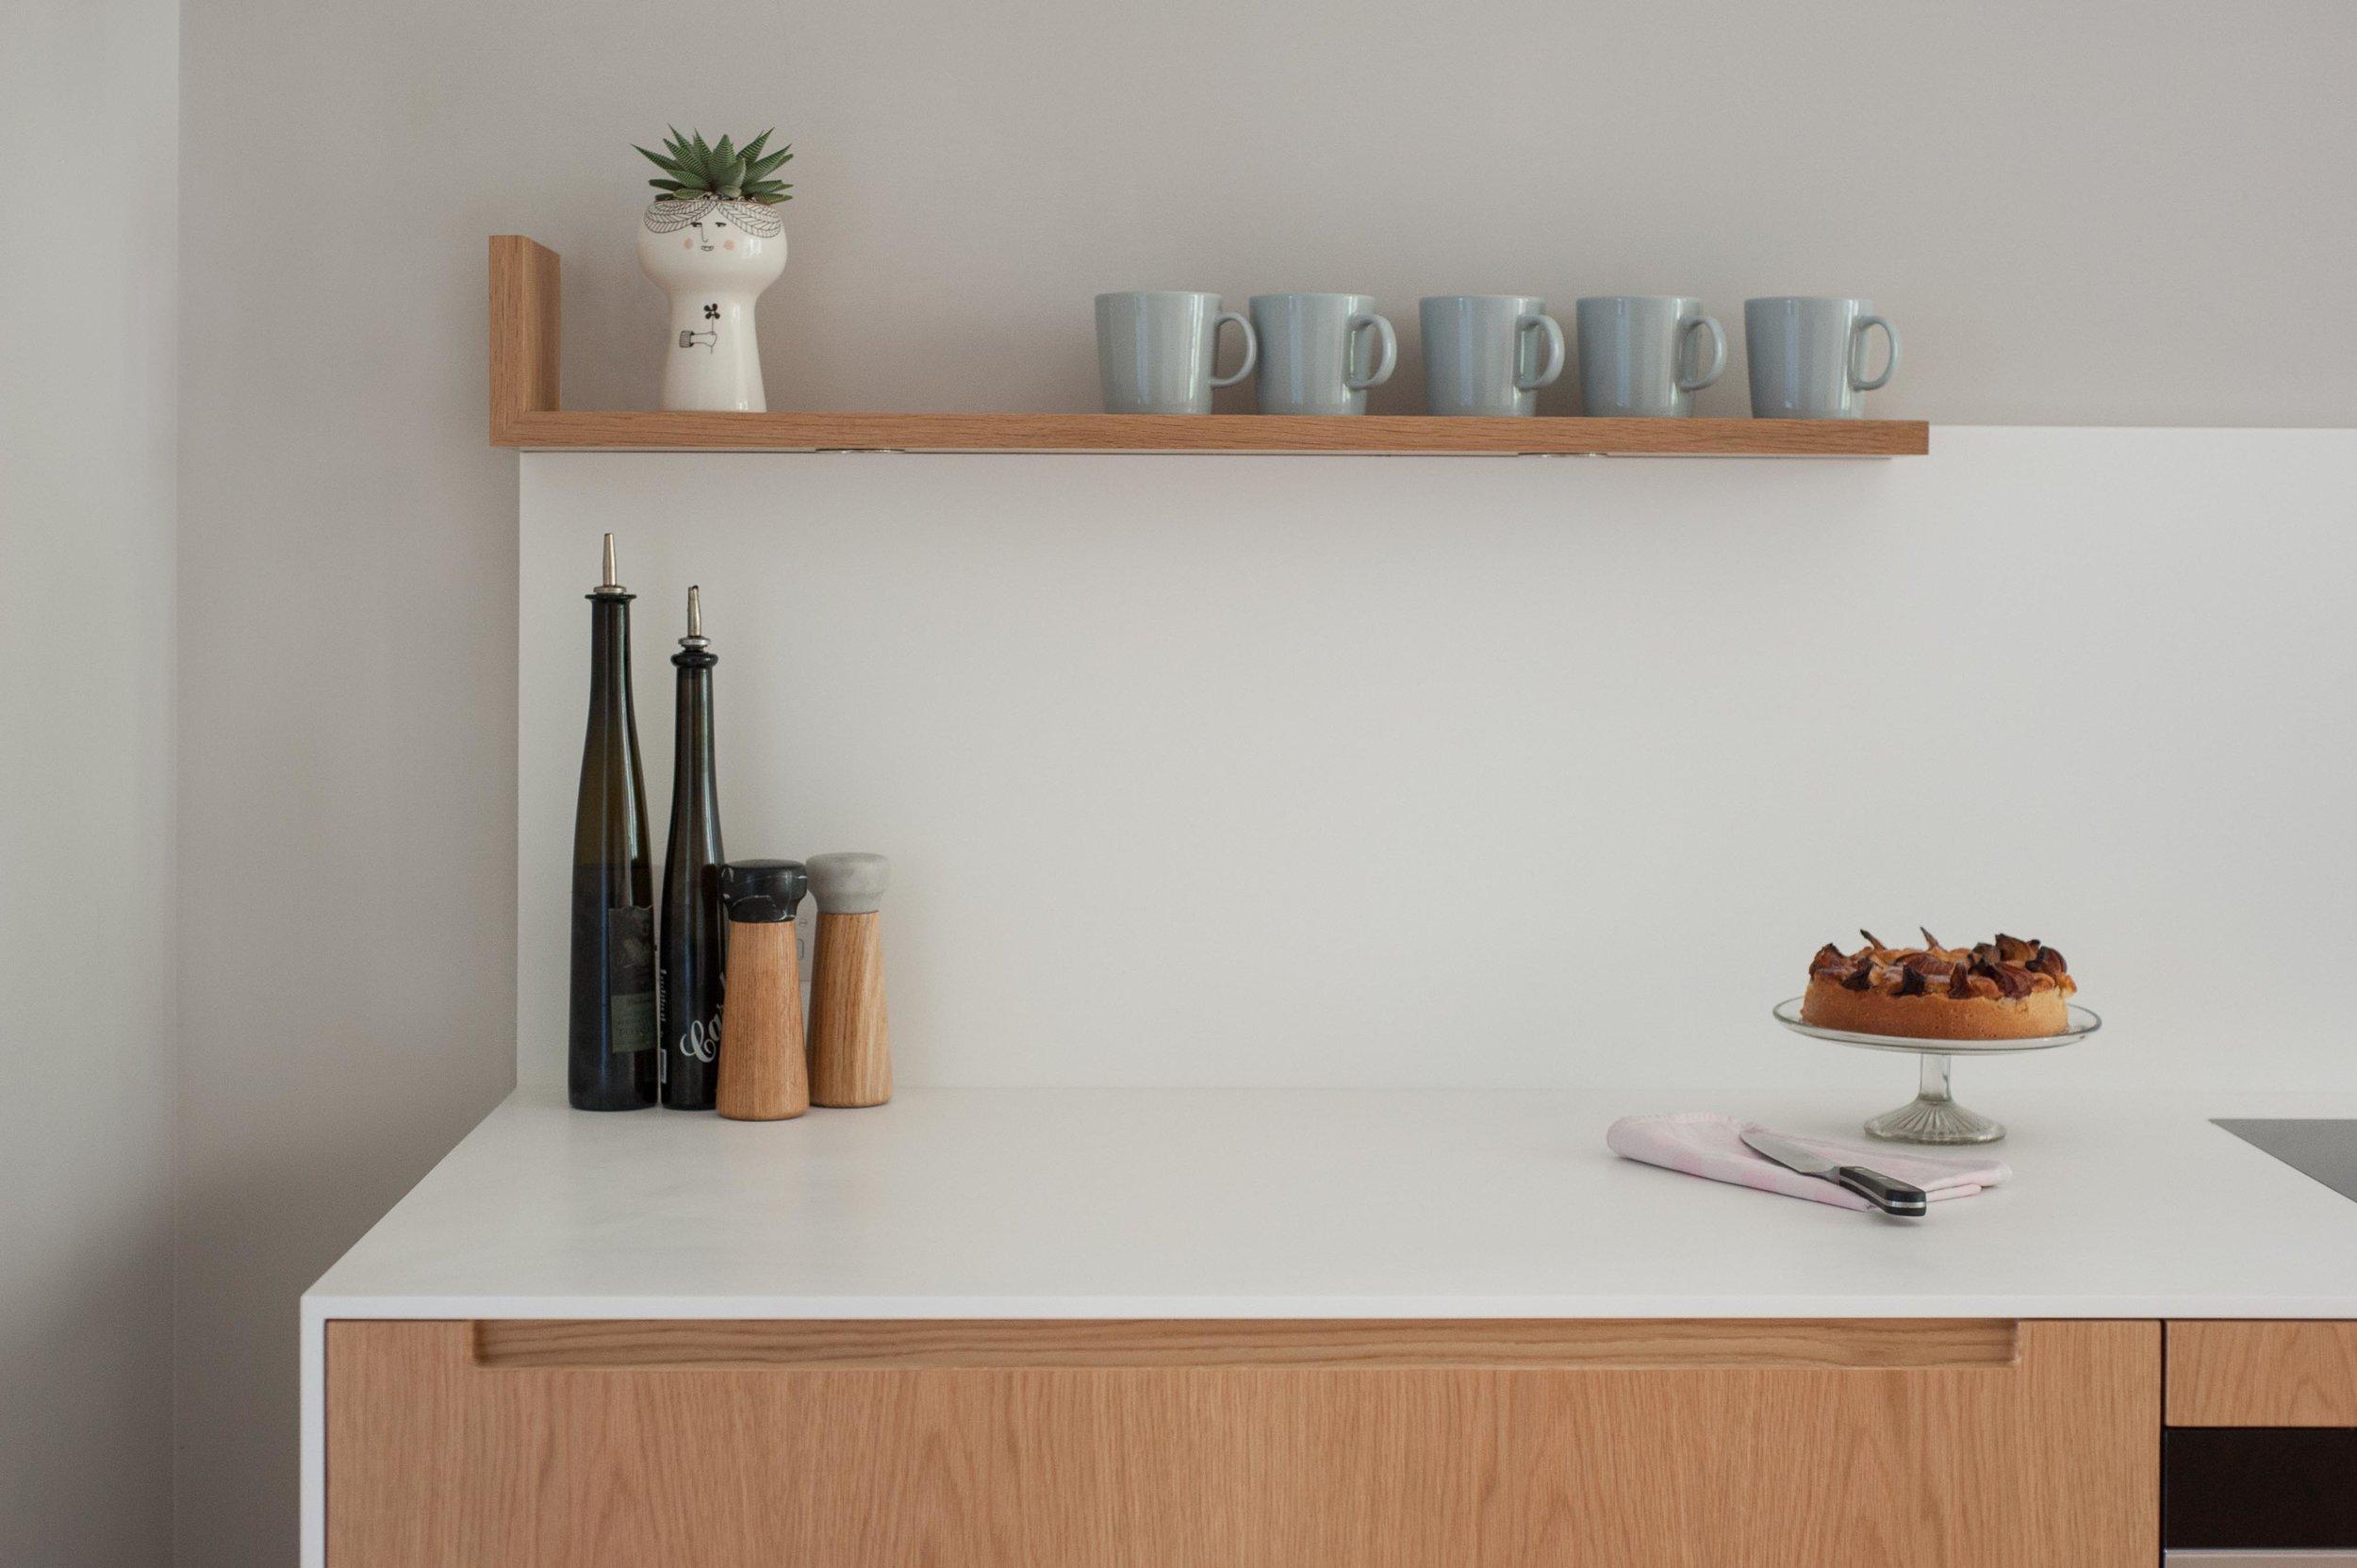 JT new Kitchen Edits SM1 (10 of 28).jpg